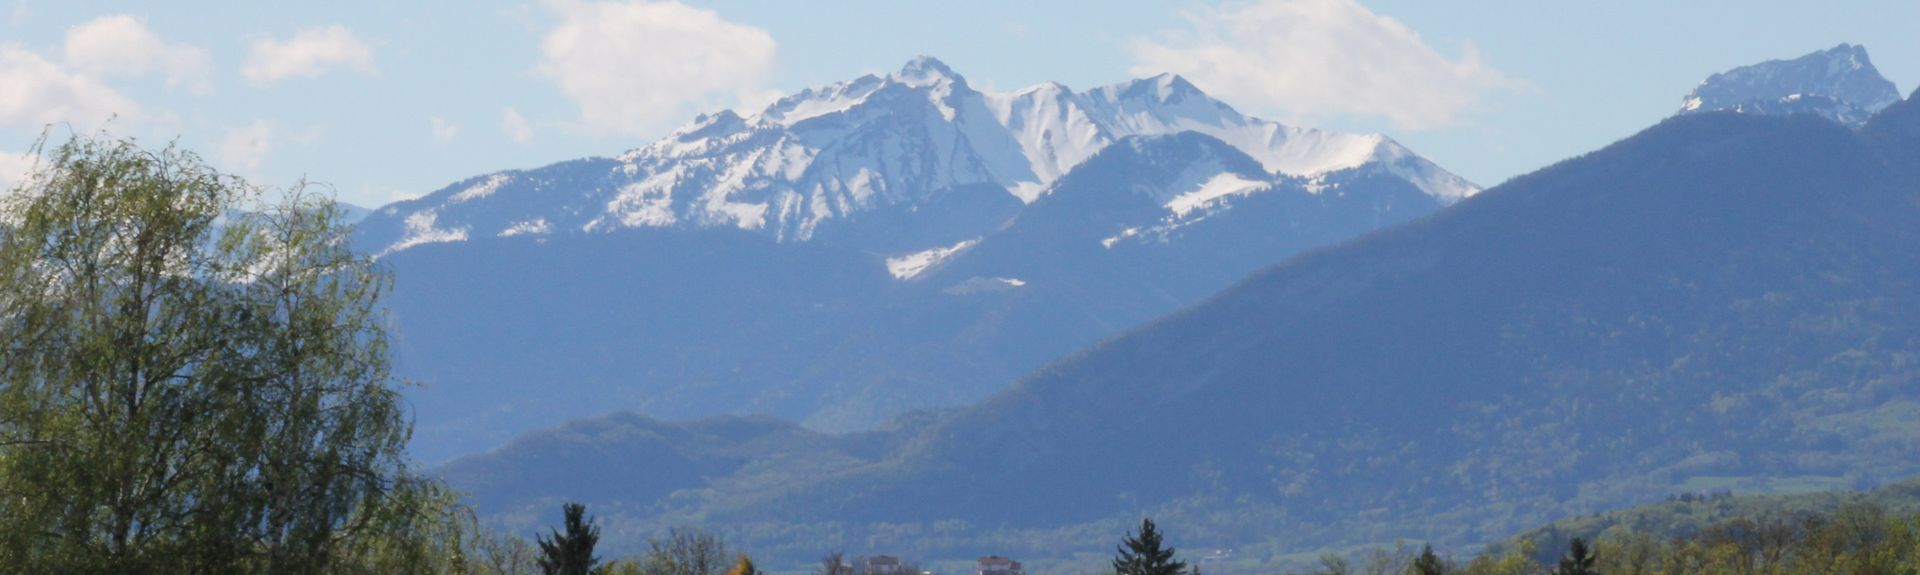 Montagny-les-Lanches, Auvergne-Rhône-Alpes, Francja